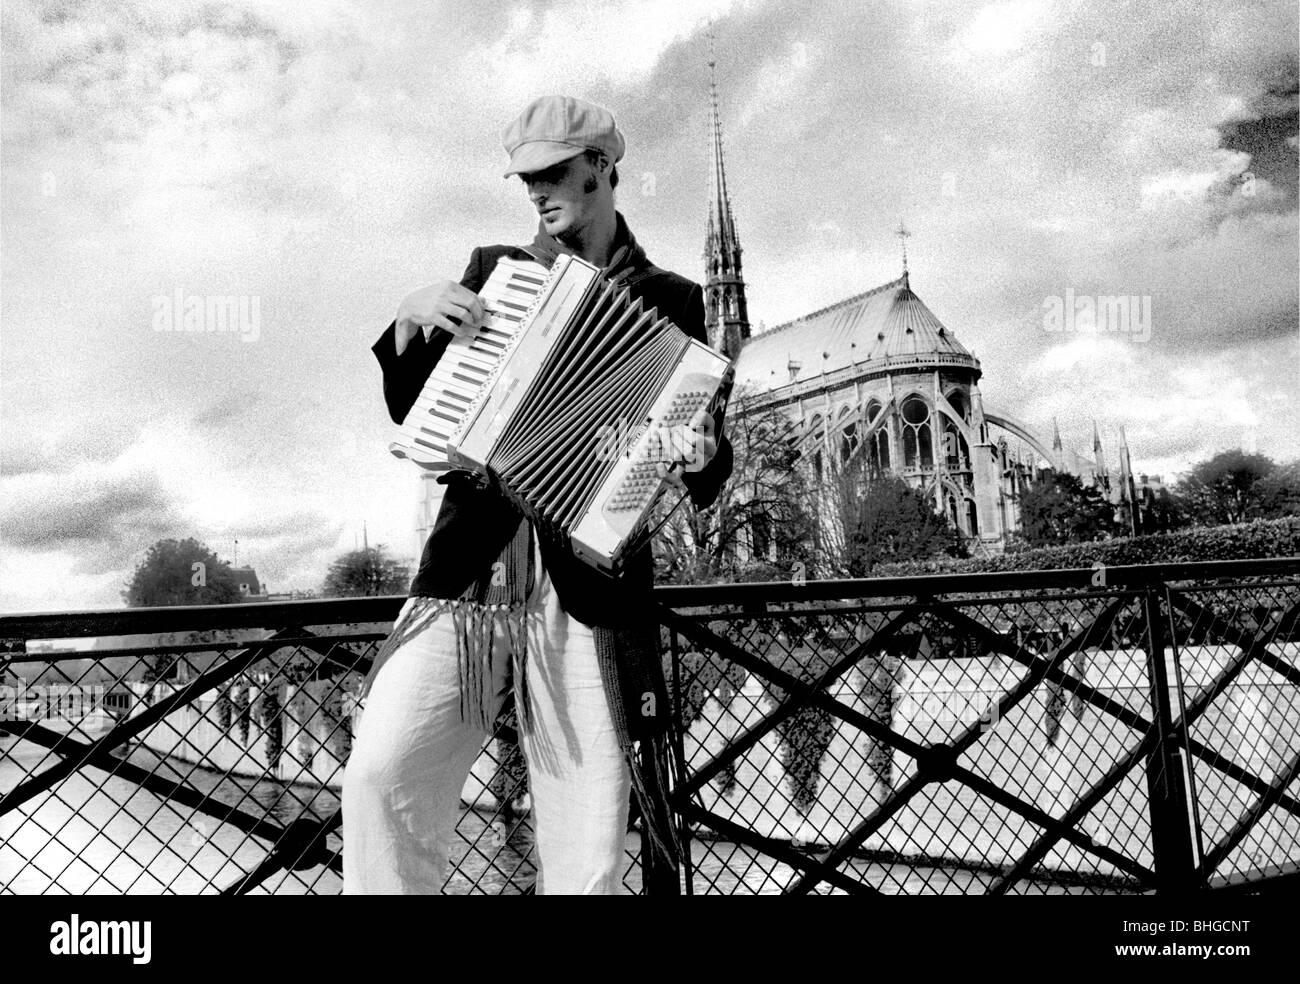 Accordion Player - Stock Image